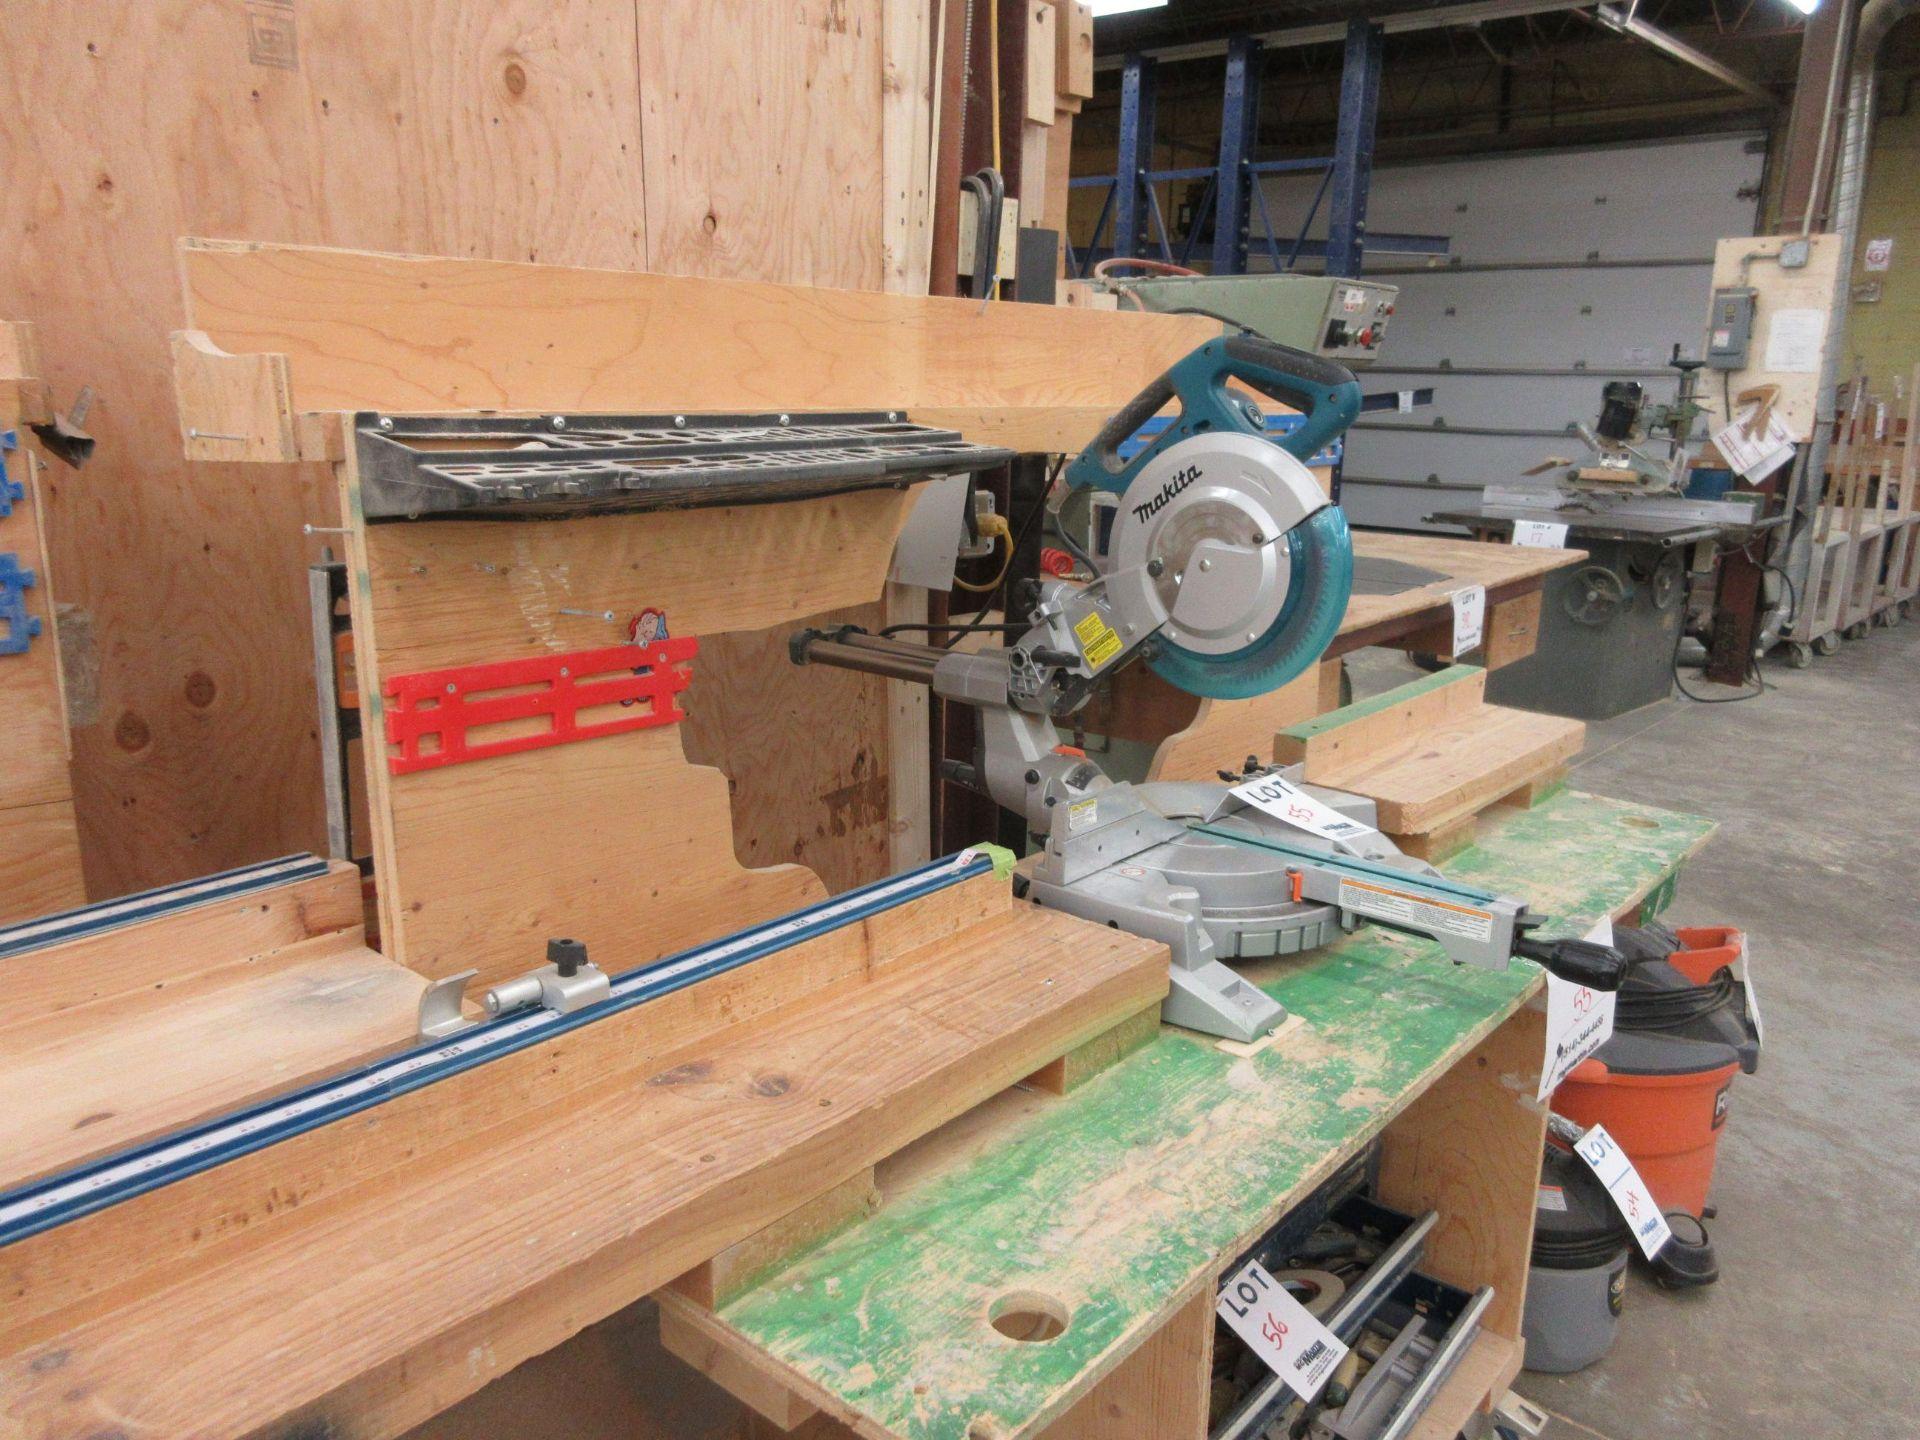 MAKITA miter saw, Mod: LS1018L c/w work table - Image 5 of 5